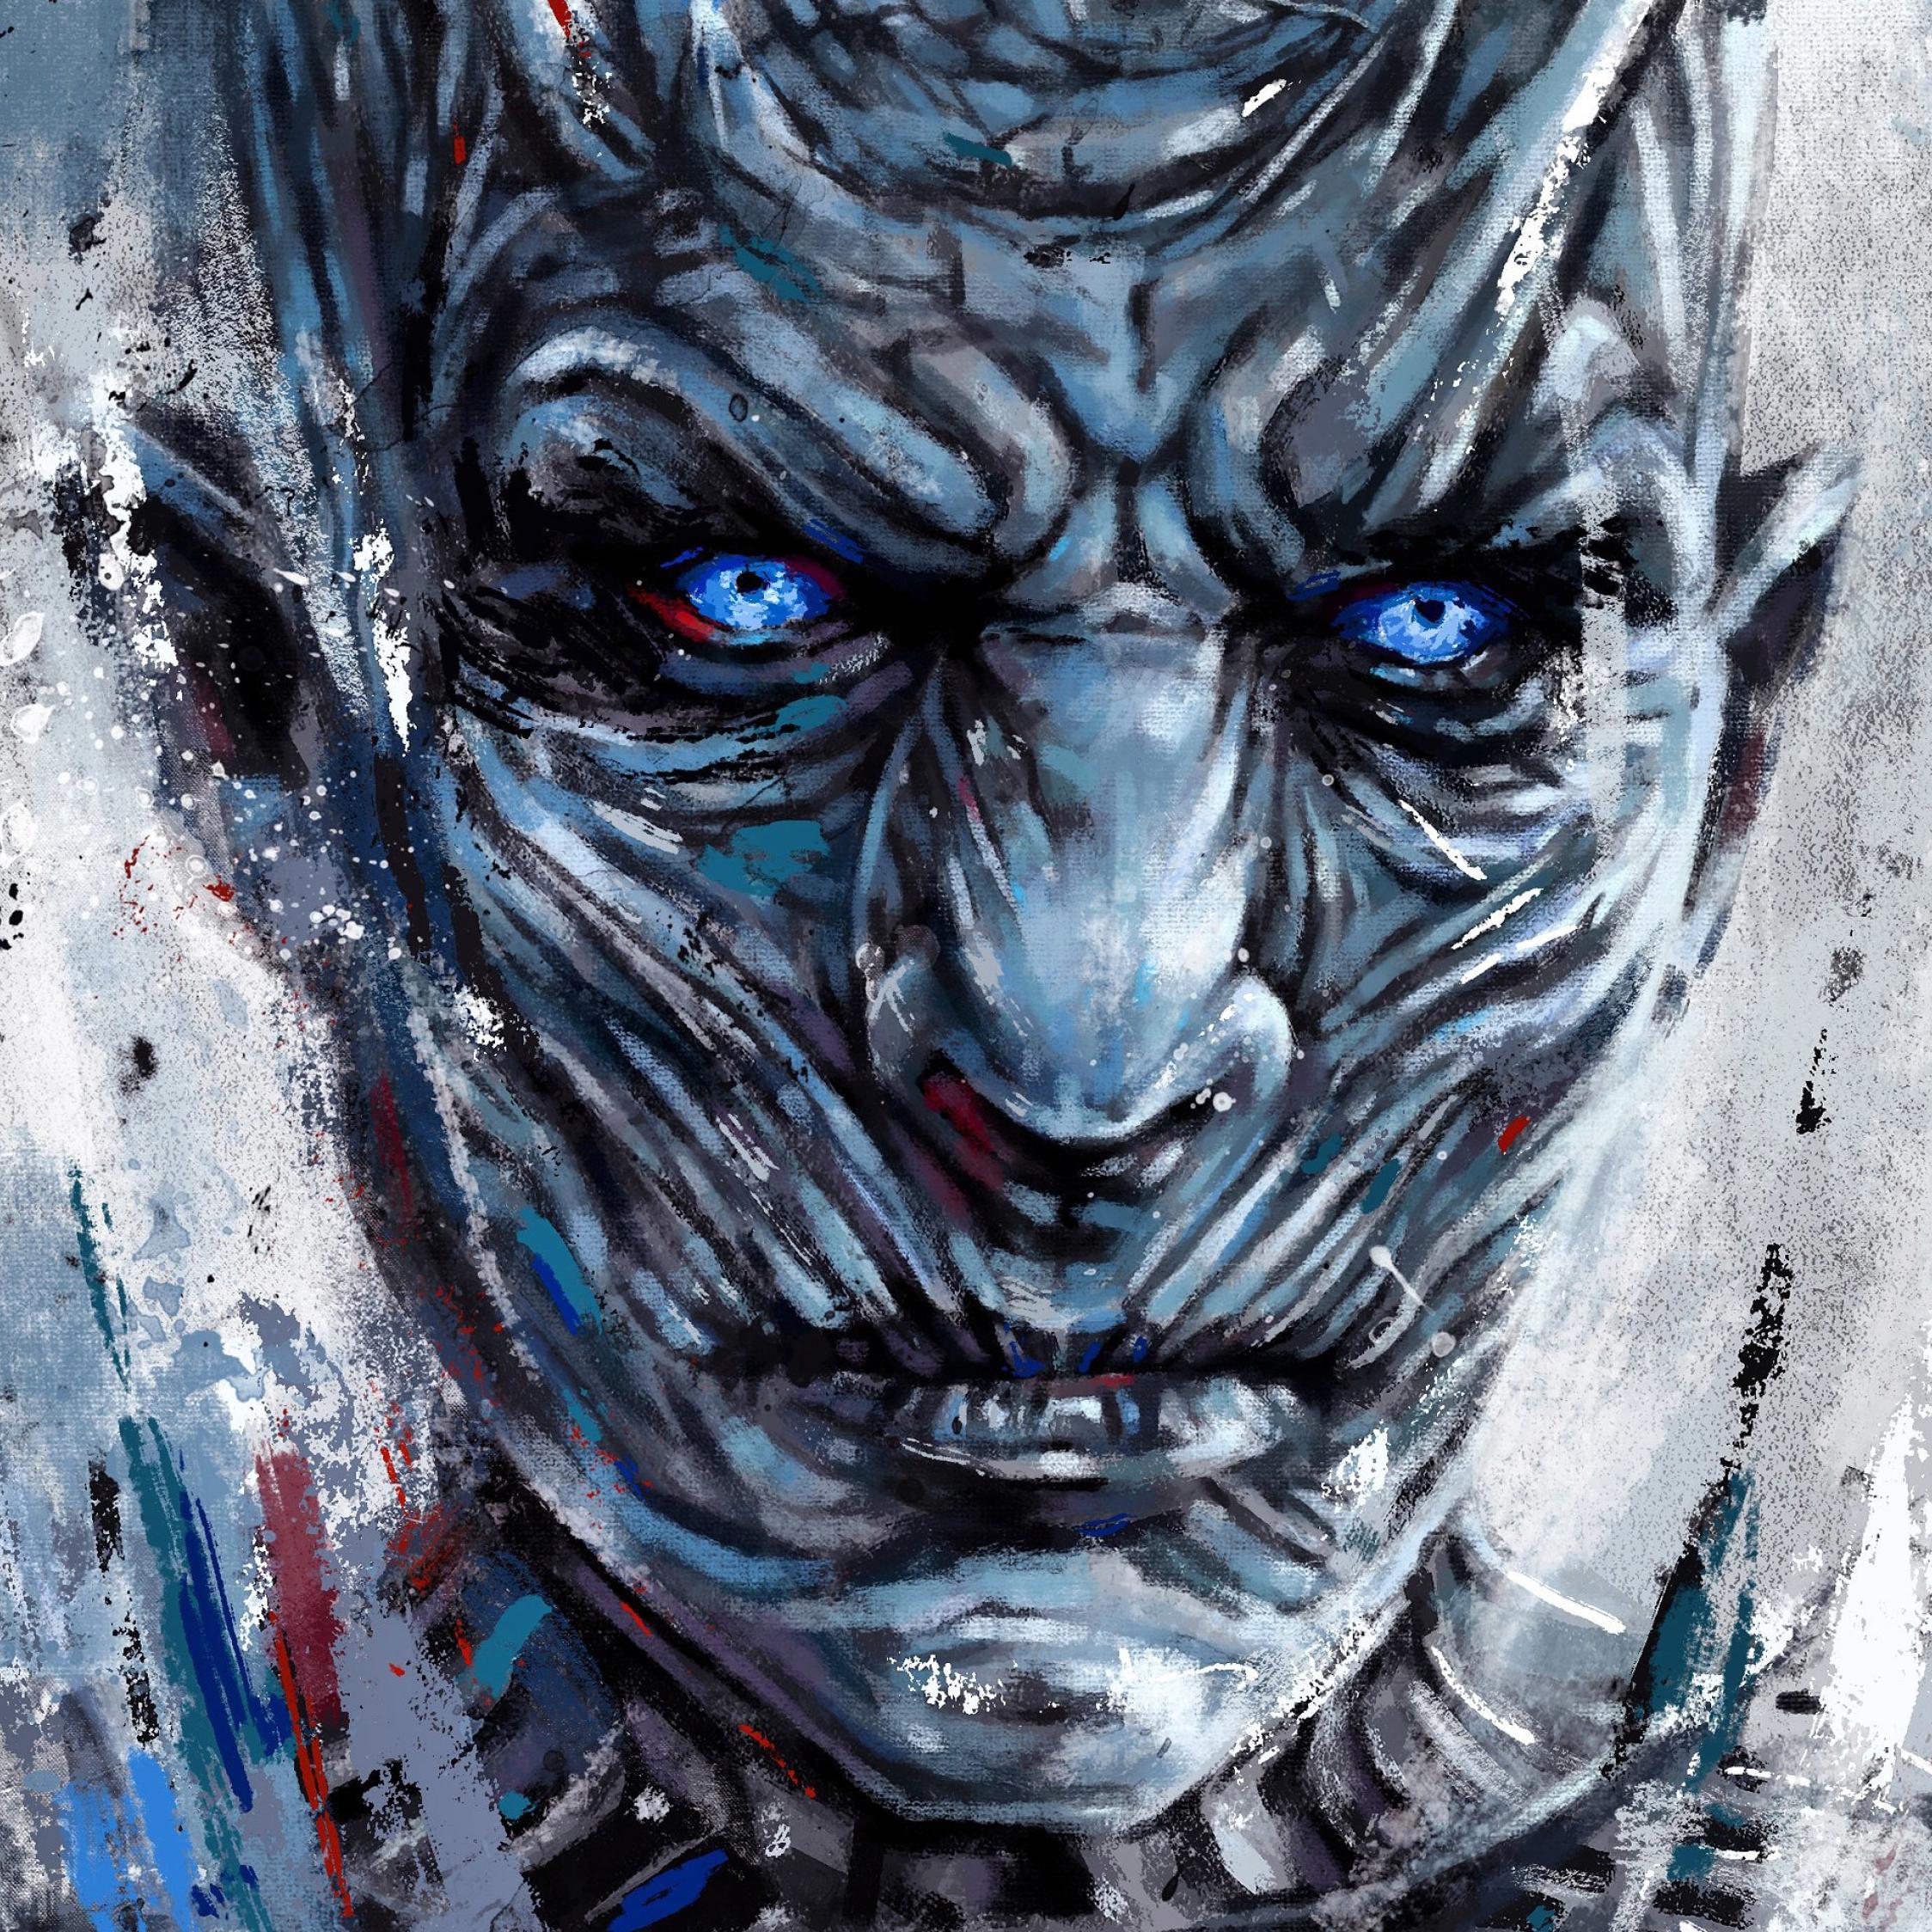 Lucifer Season 3 Hd 4k Wallpaper: Night King Got Artwork, HD 4K Wallpaper